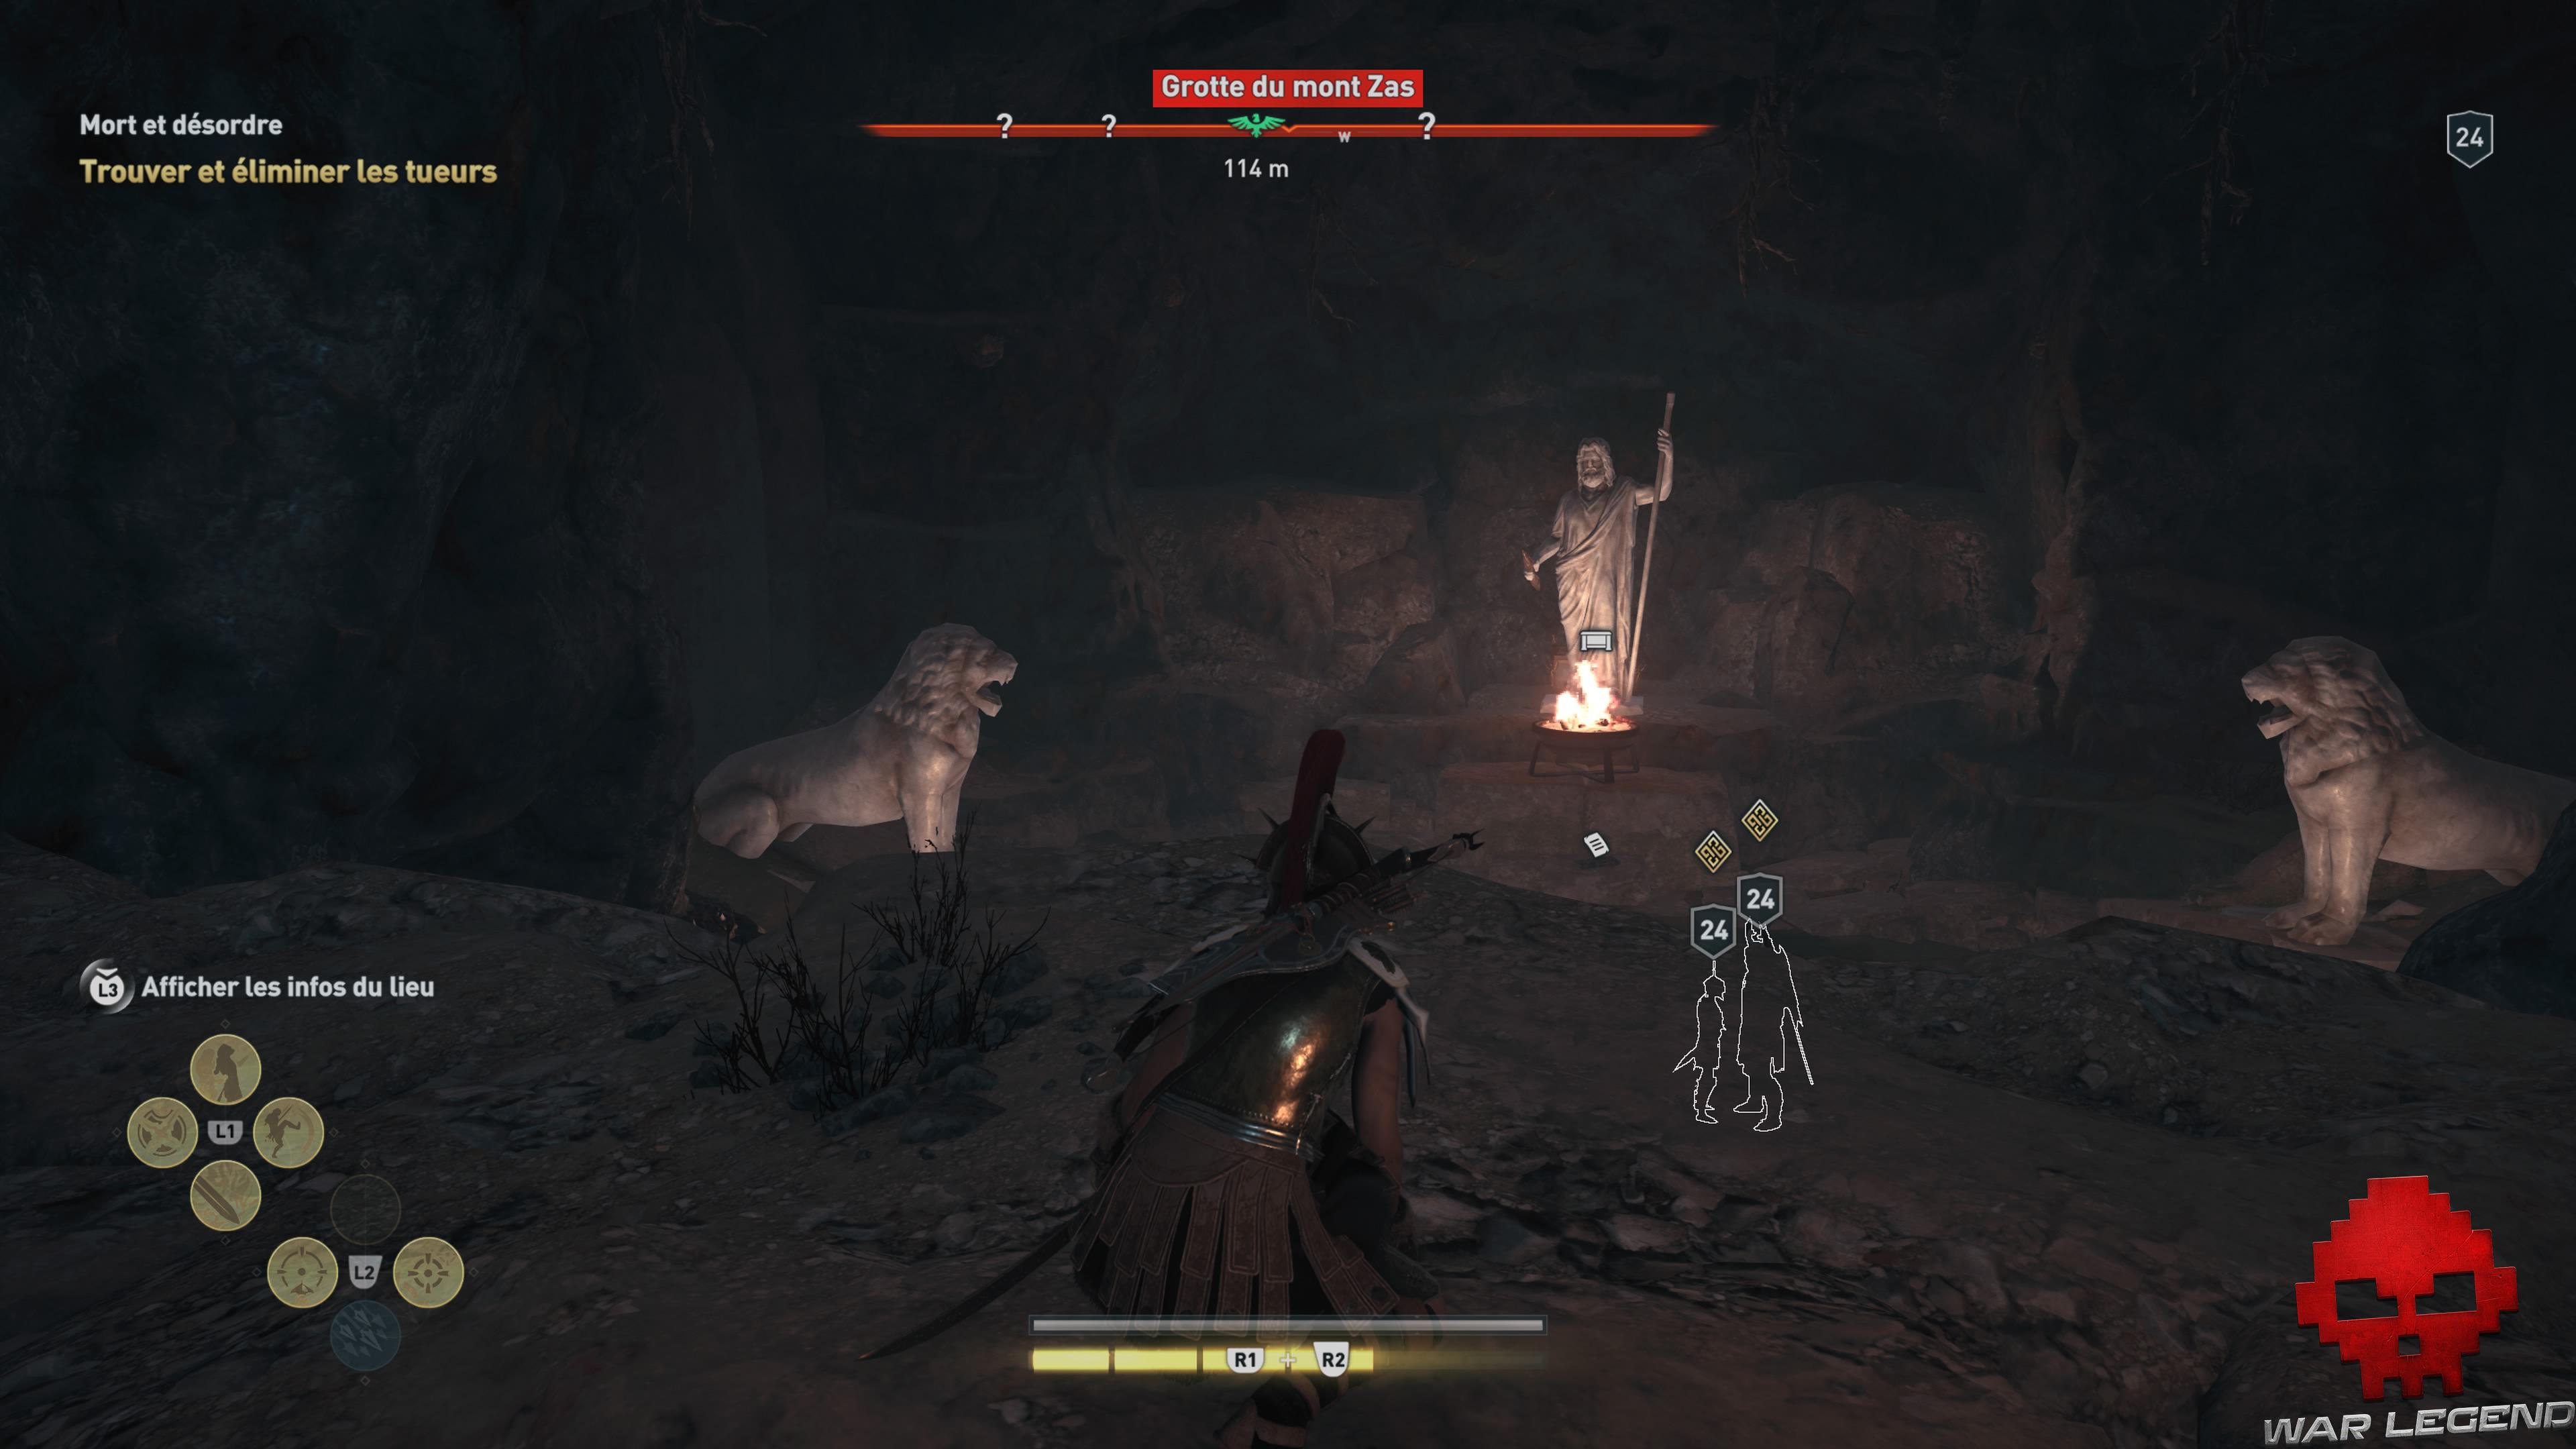 Guide débutant Assassin's Creed Odyssey - Kassandra surplombe deux ennemis